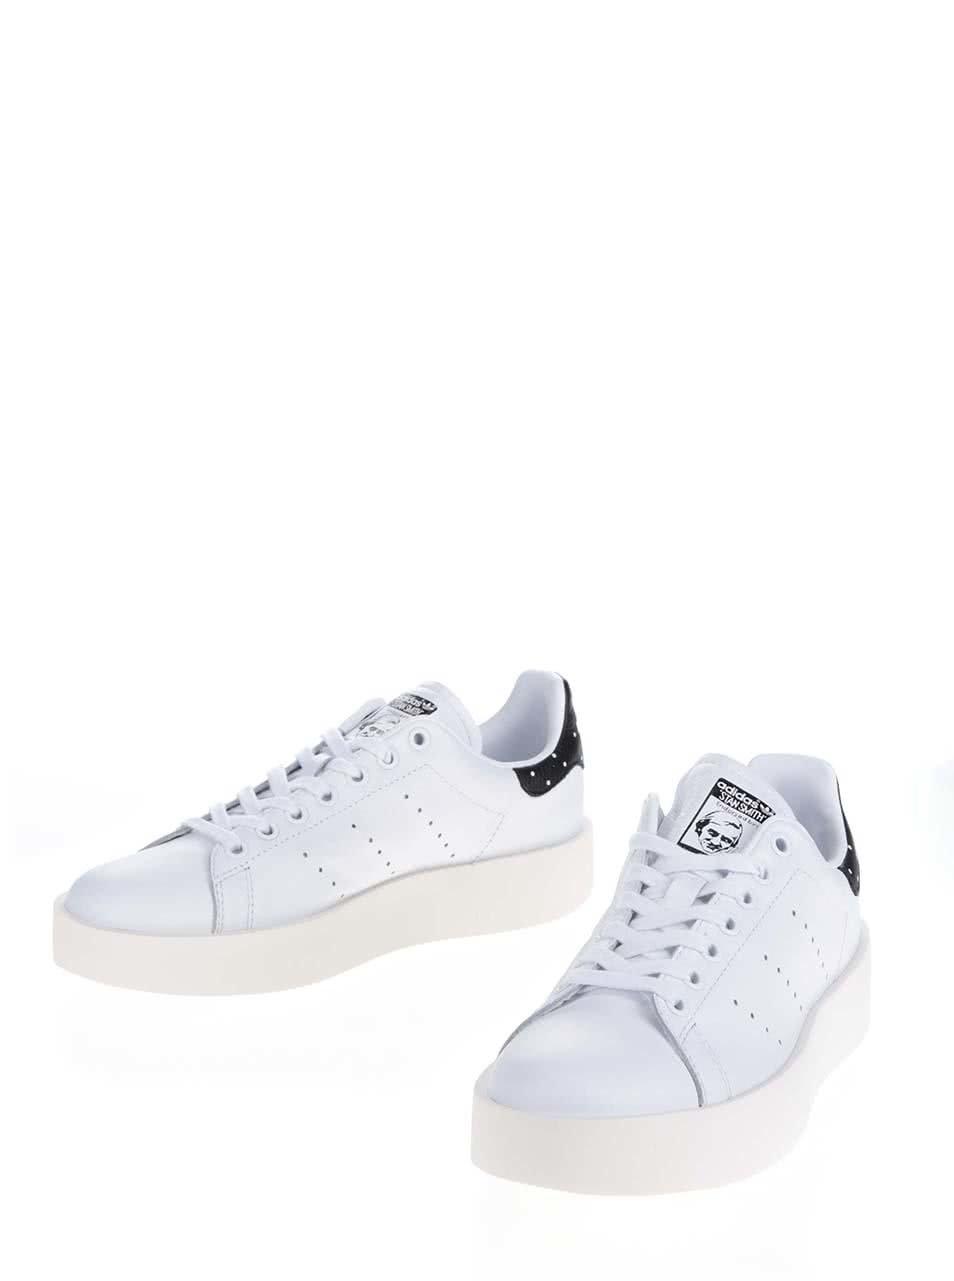 14dfa0612d Biele dámske kožené tenisky na platforme adidas Originals Stan Smith ...